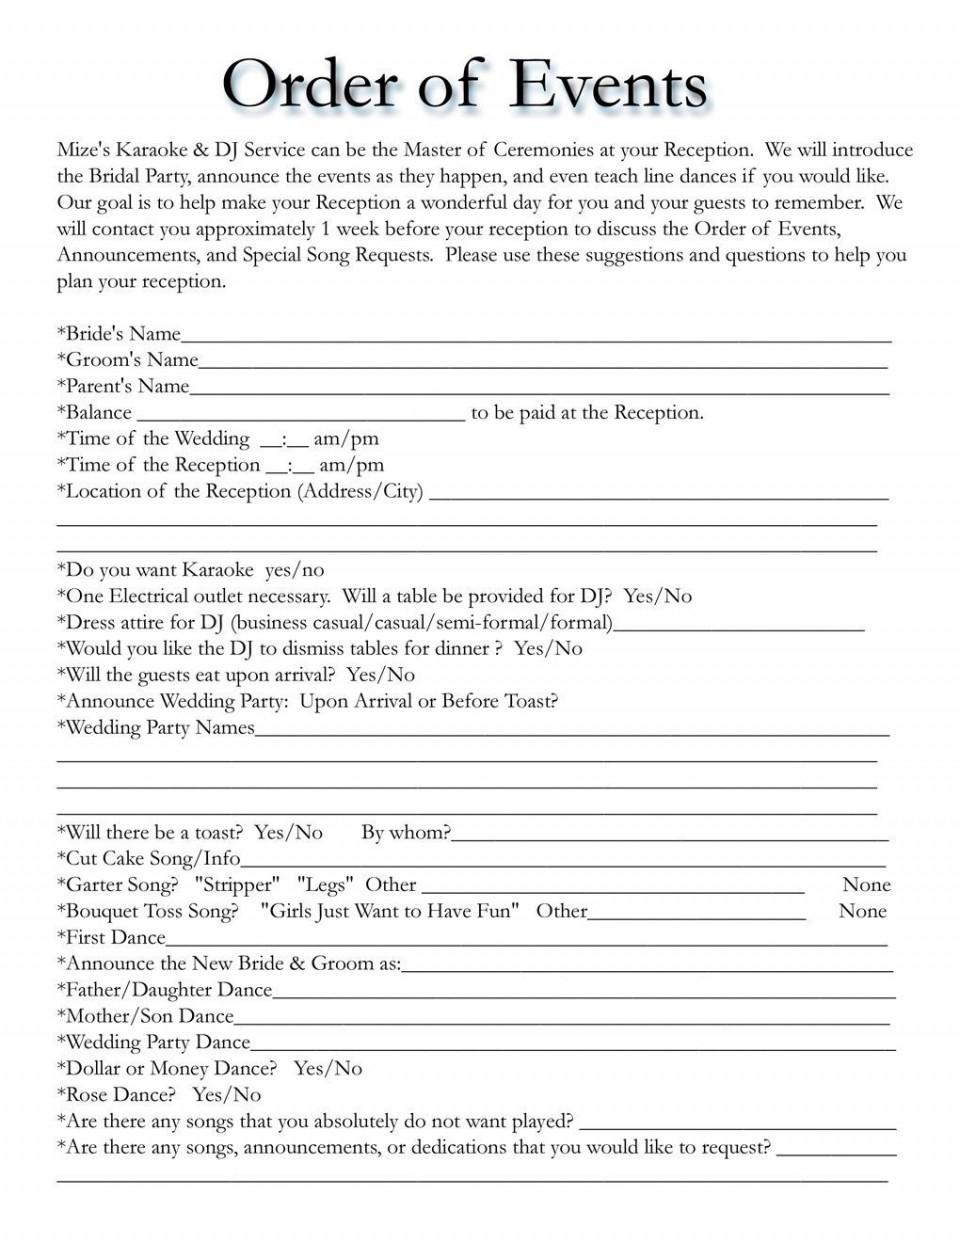 002 Formidable Wedding Timeline Template Free Sample  Day Excel Program960